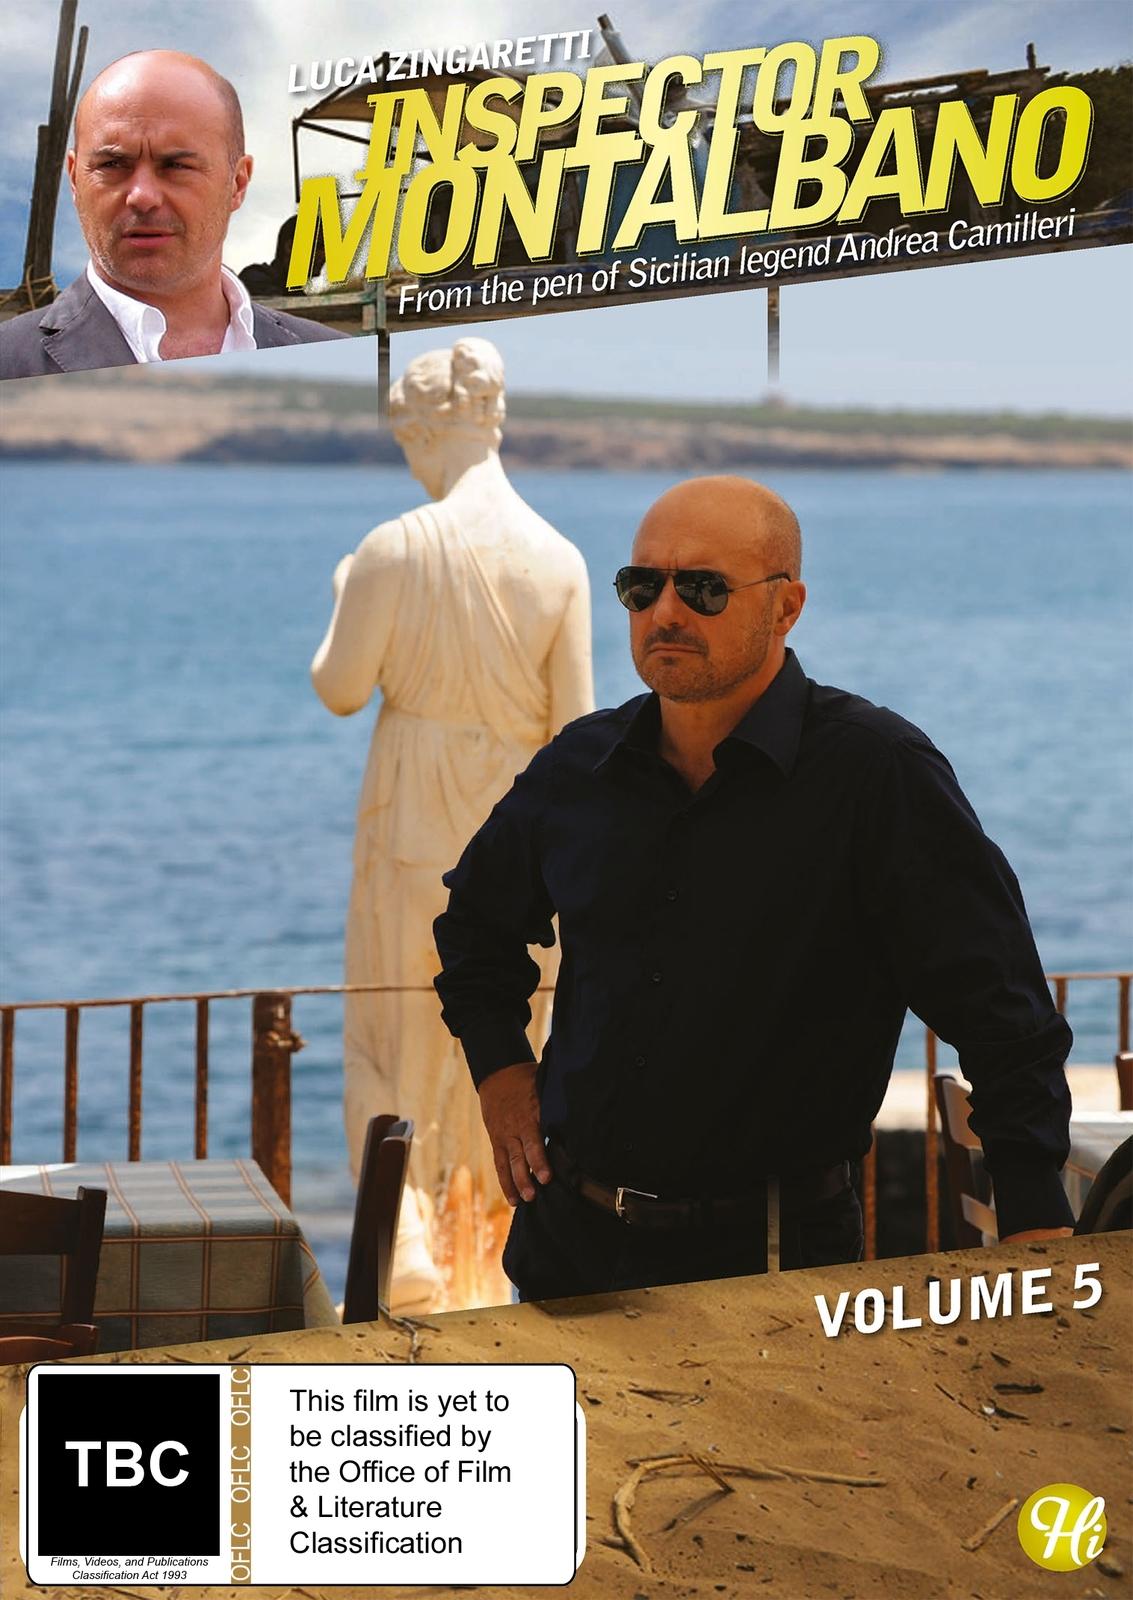 inspector montalbano season 3